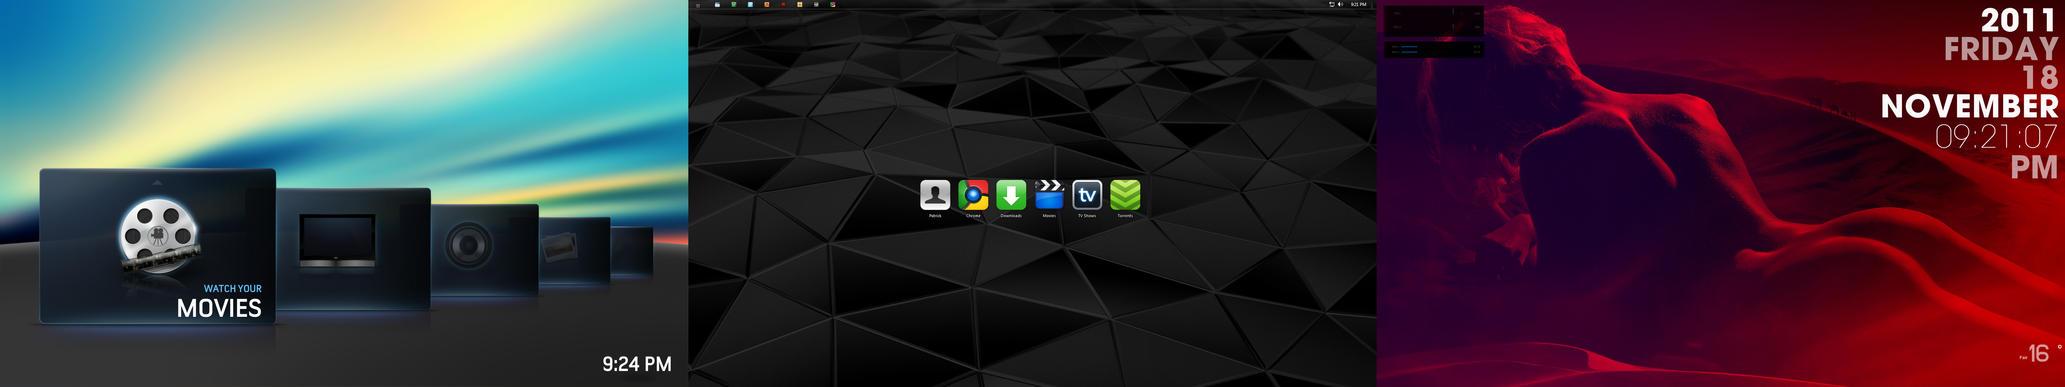 November Desktops 2011 by chalkley3